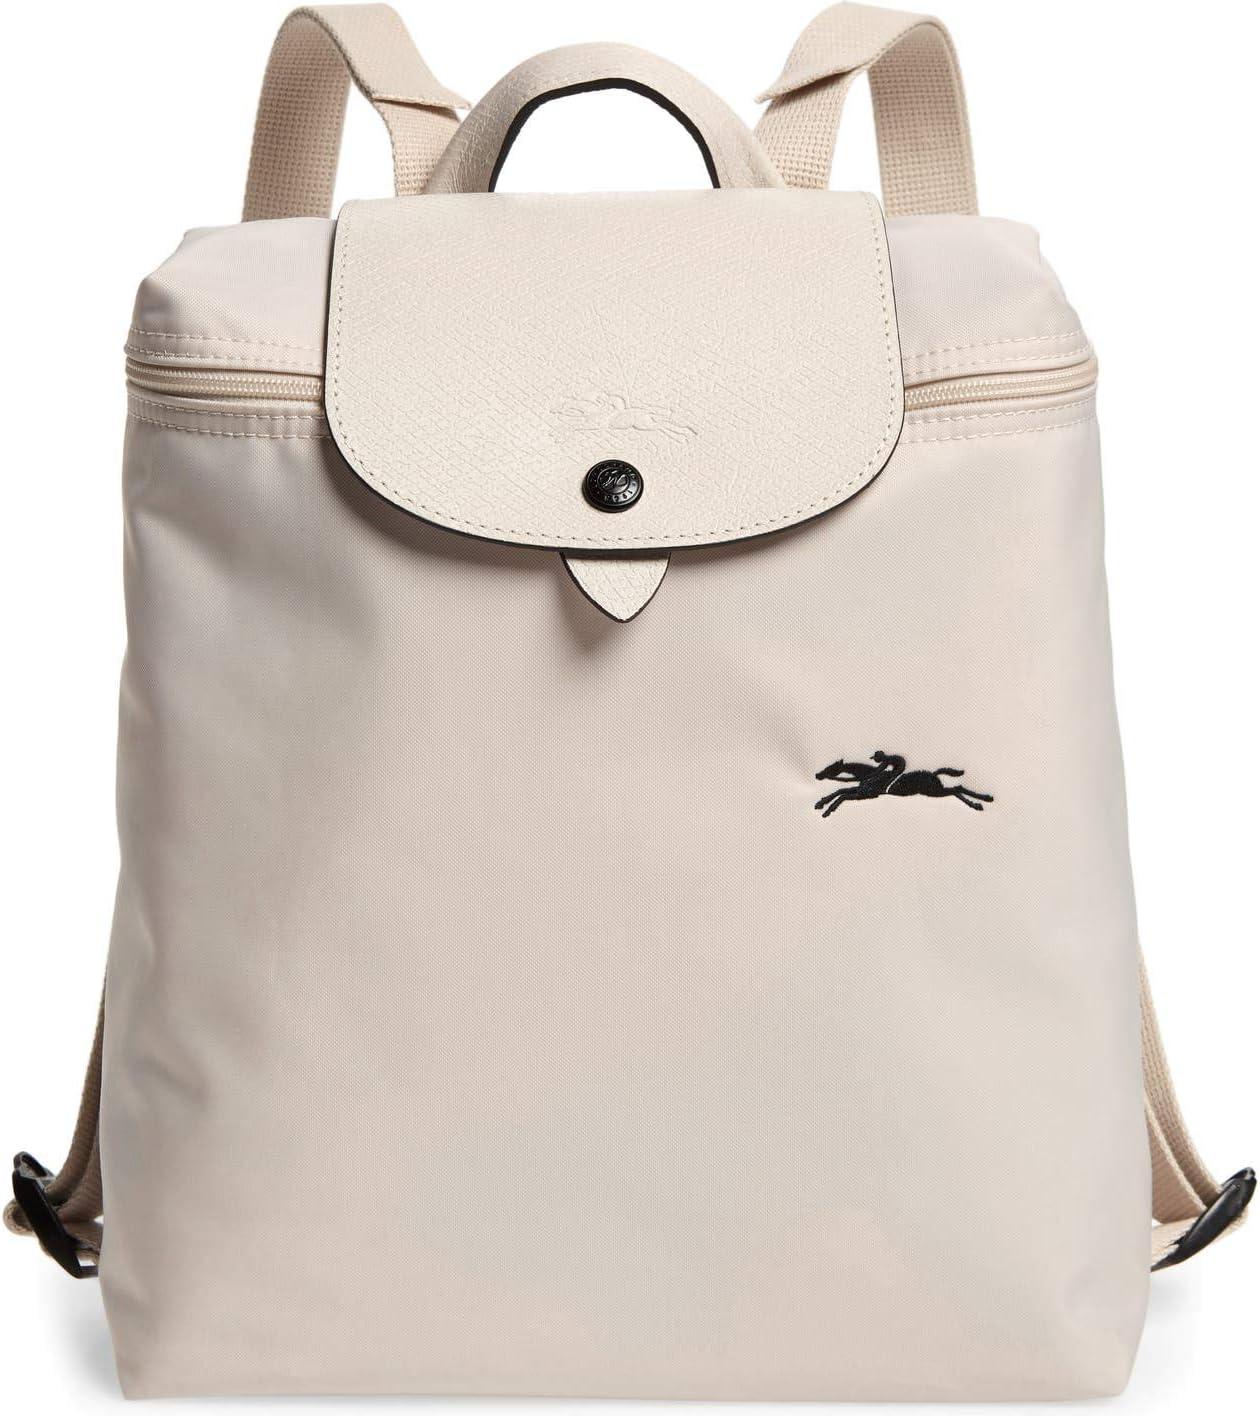 Amazon.com: Longchamp 'Le Pliage' Nylon and Leather Club Backpack ...